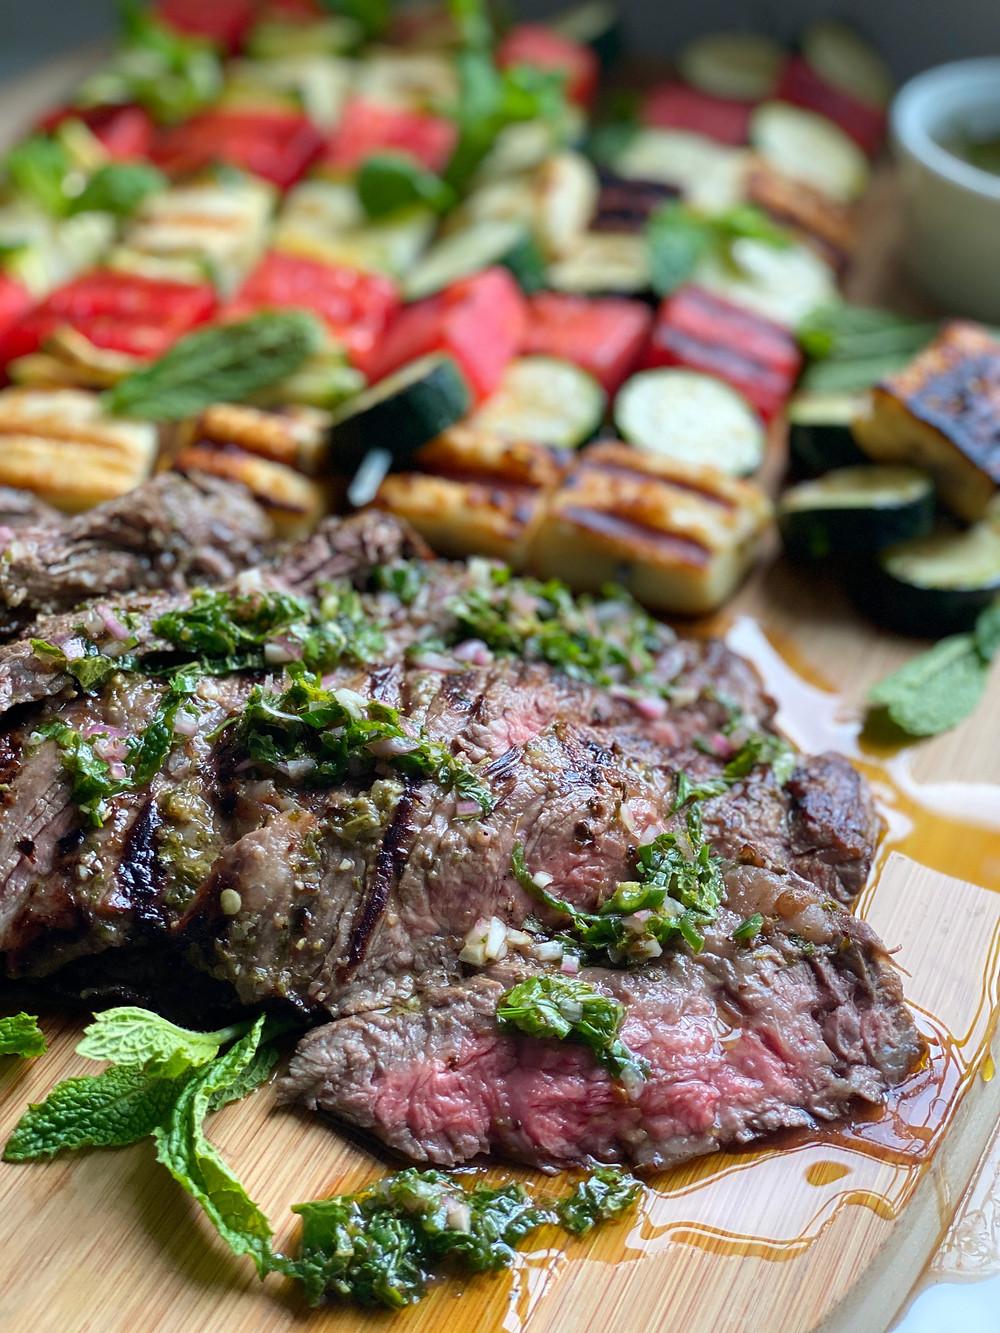 Grilled Mint Chimichurri Skirt Steak  & Skewers of Watermelon, Zucchini & Halloumi